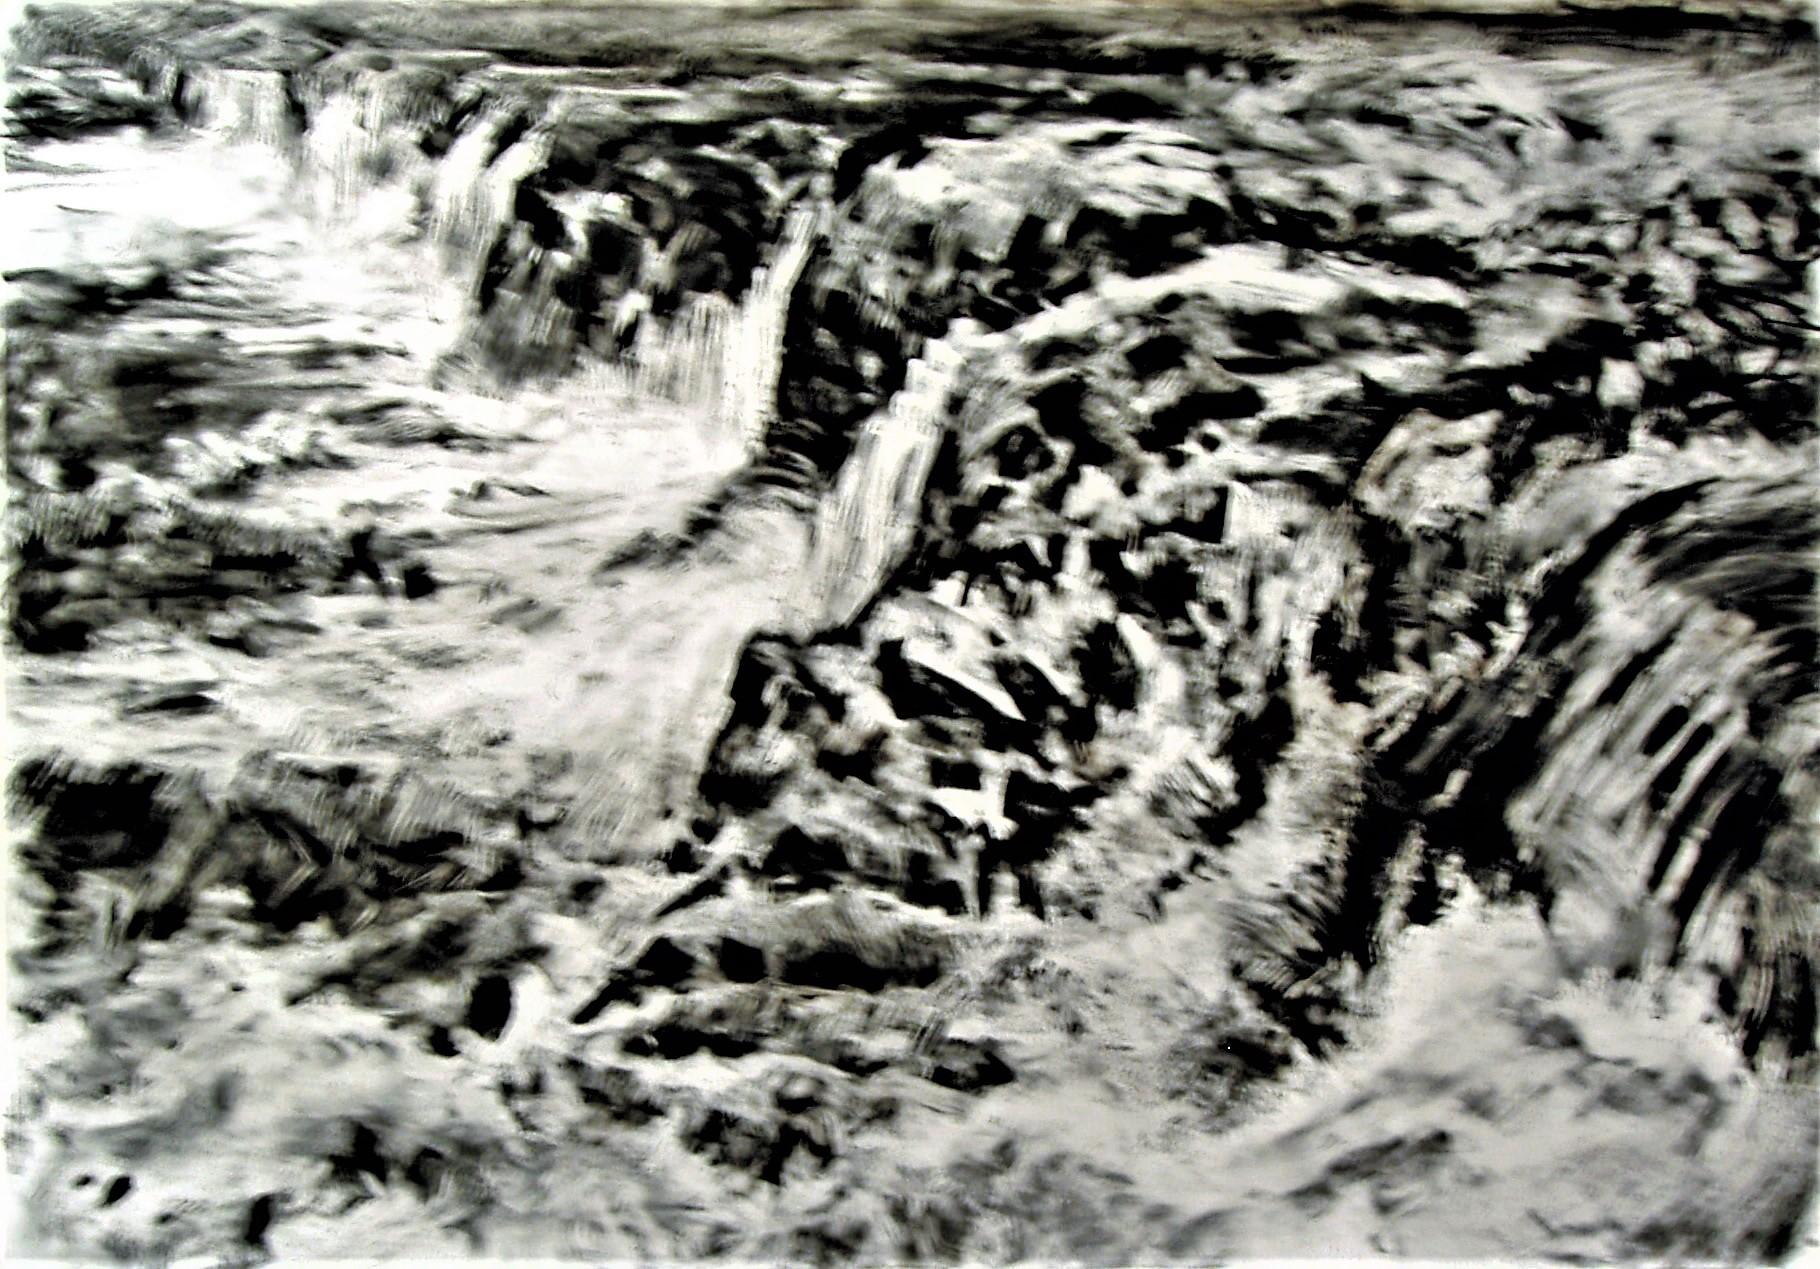 abramson, gertrude #3 waterfalls